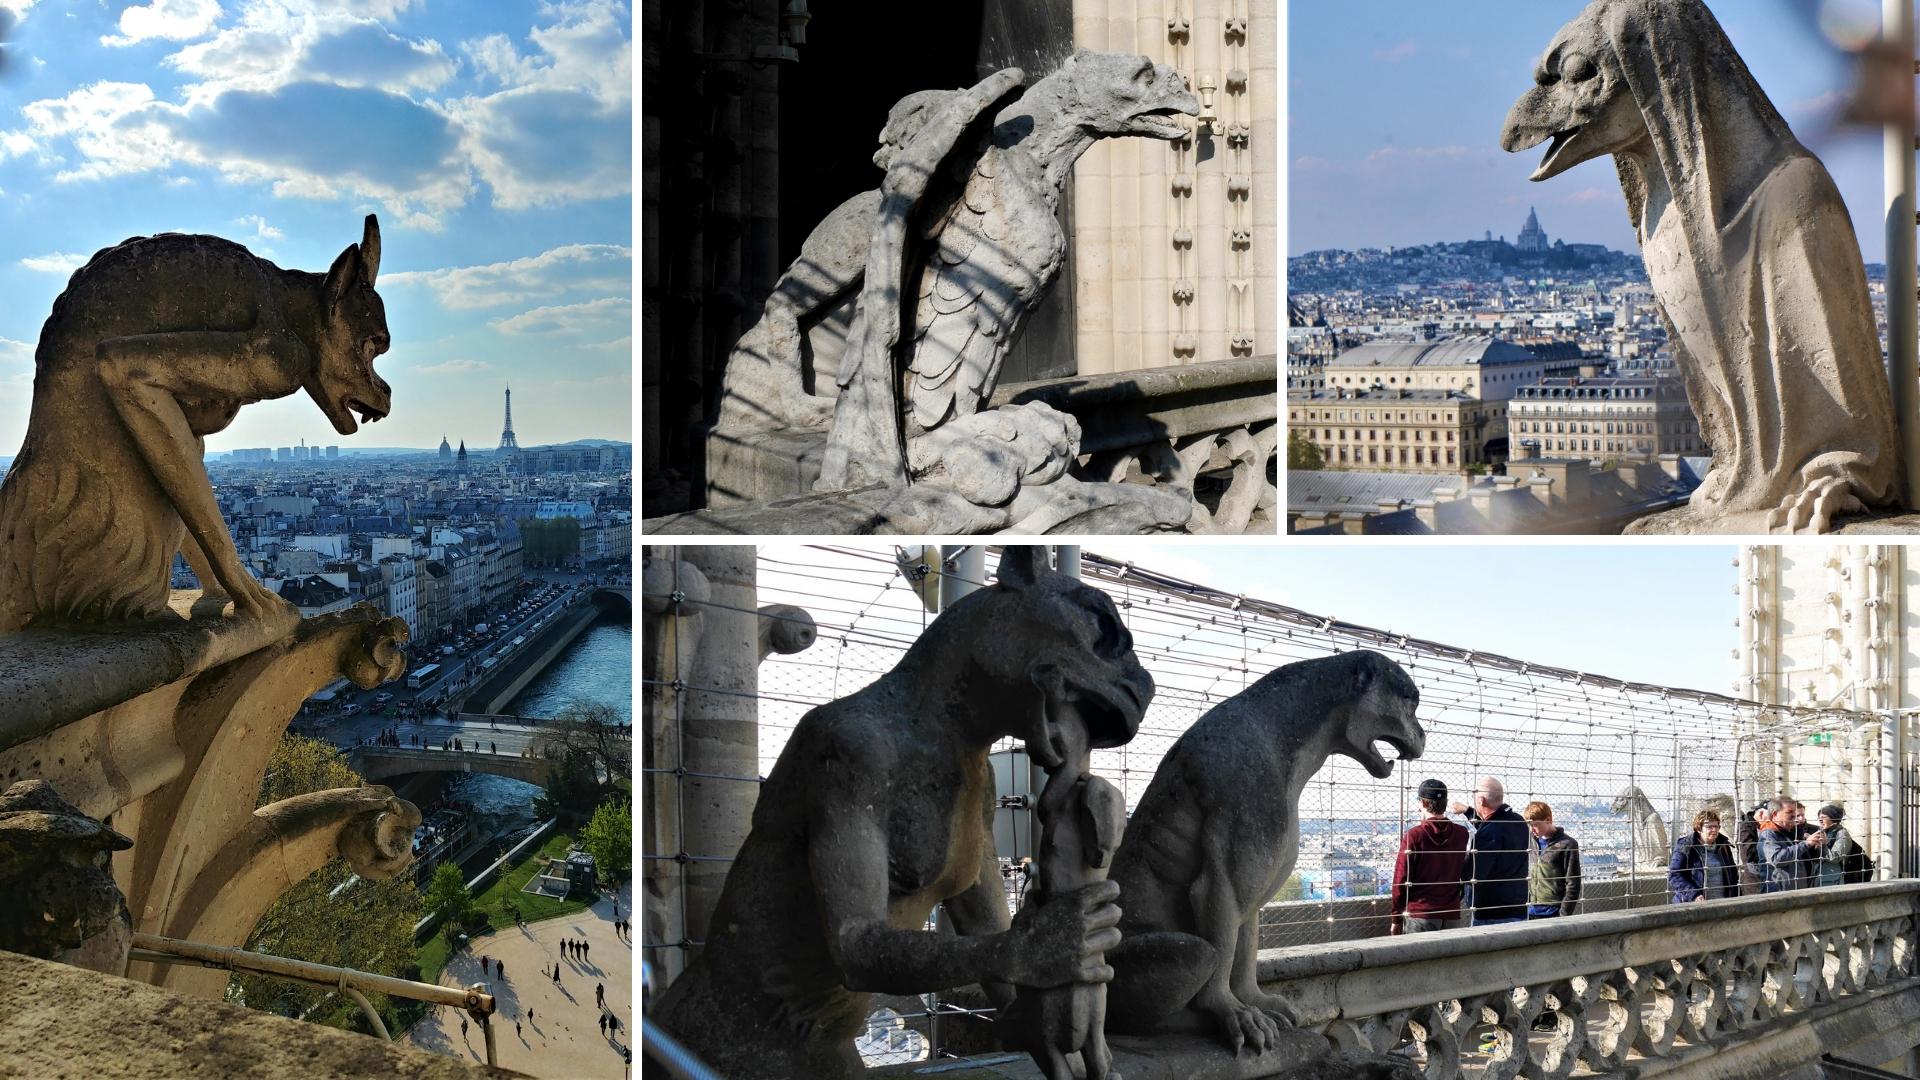 Notre-Dame Paris chimeres gargouilles visiter blog voyage france arpenter le chemin